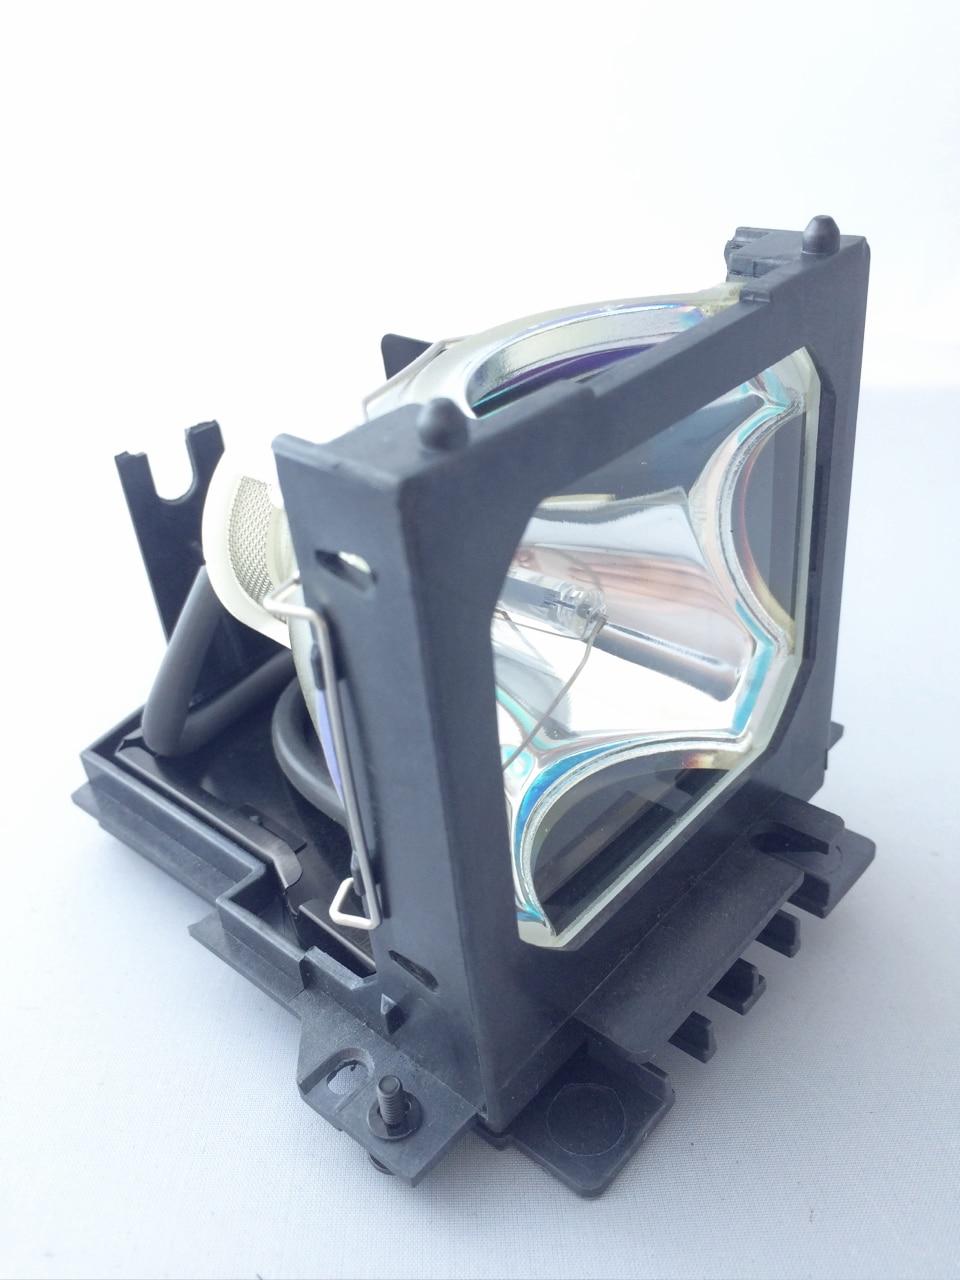 Replacement Projector Lamp DT00601 for HITACHI CP-HX6300 / CP-HX6500 / CP-HX6500A / CP-SX1350 / CP-SX1350W ETC цена